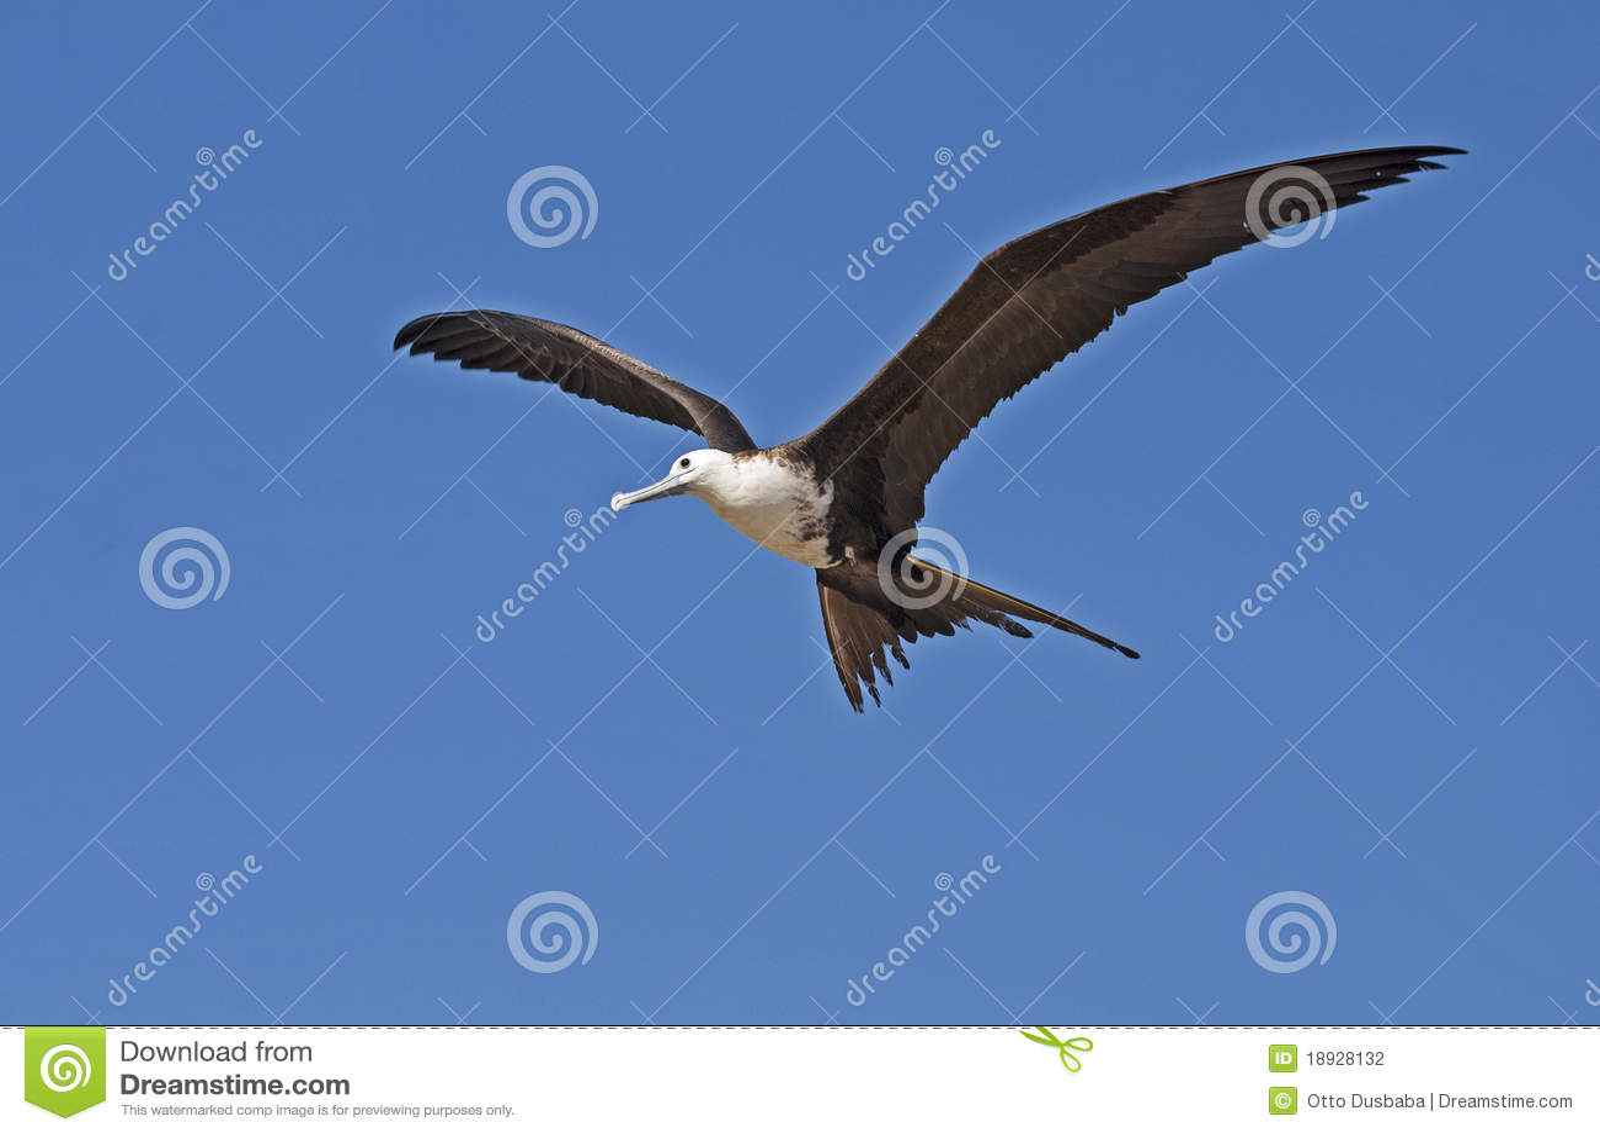 Magnificent frigate bird in the air